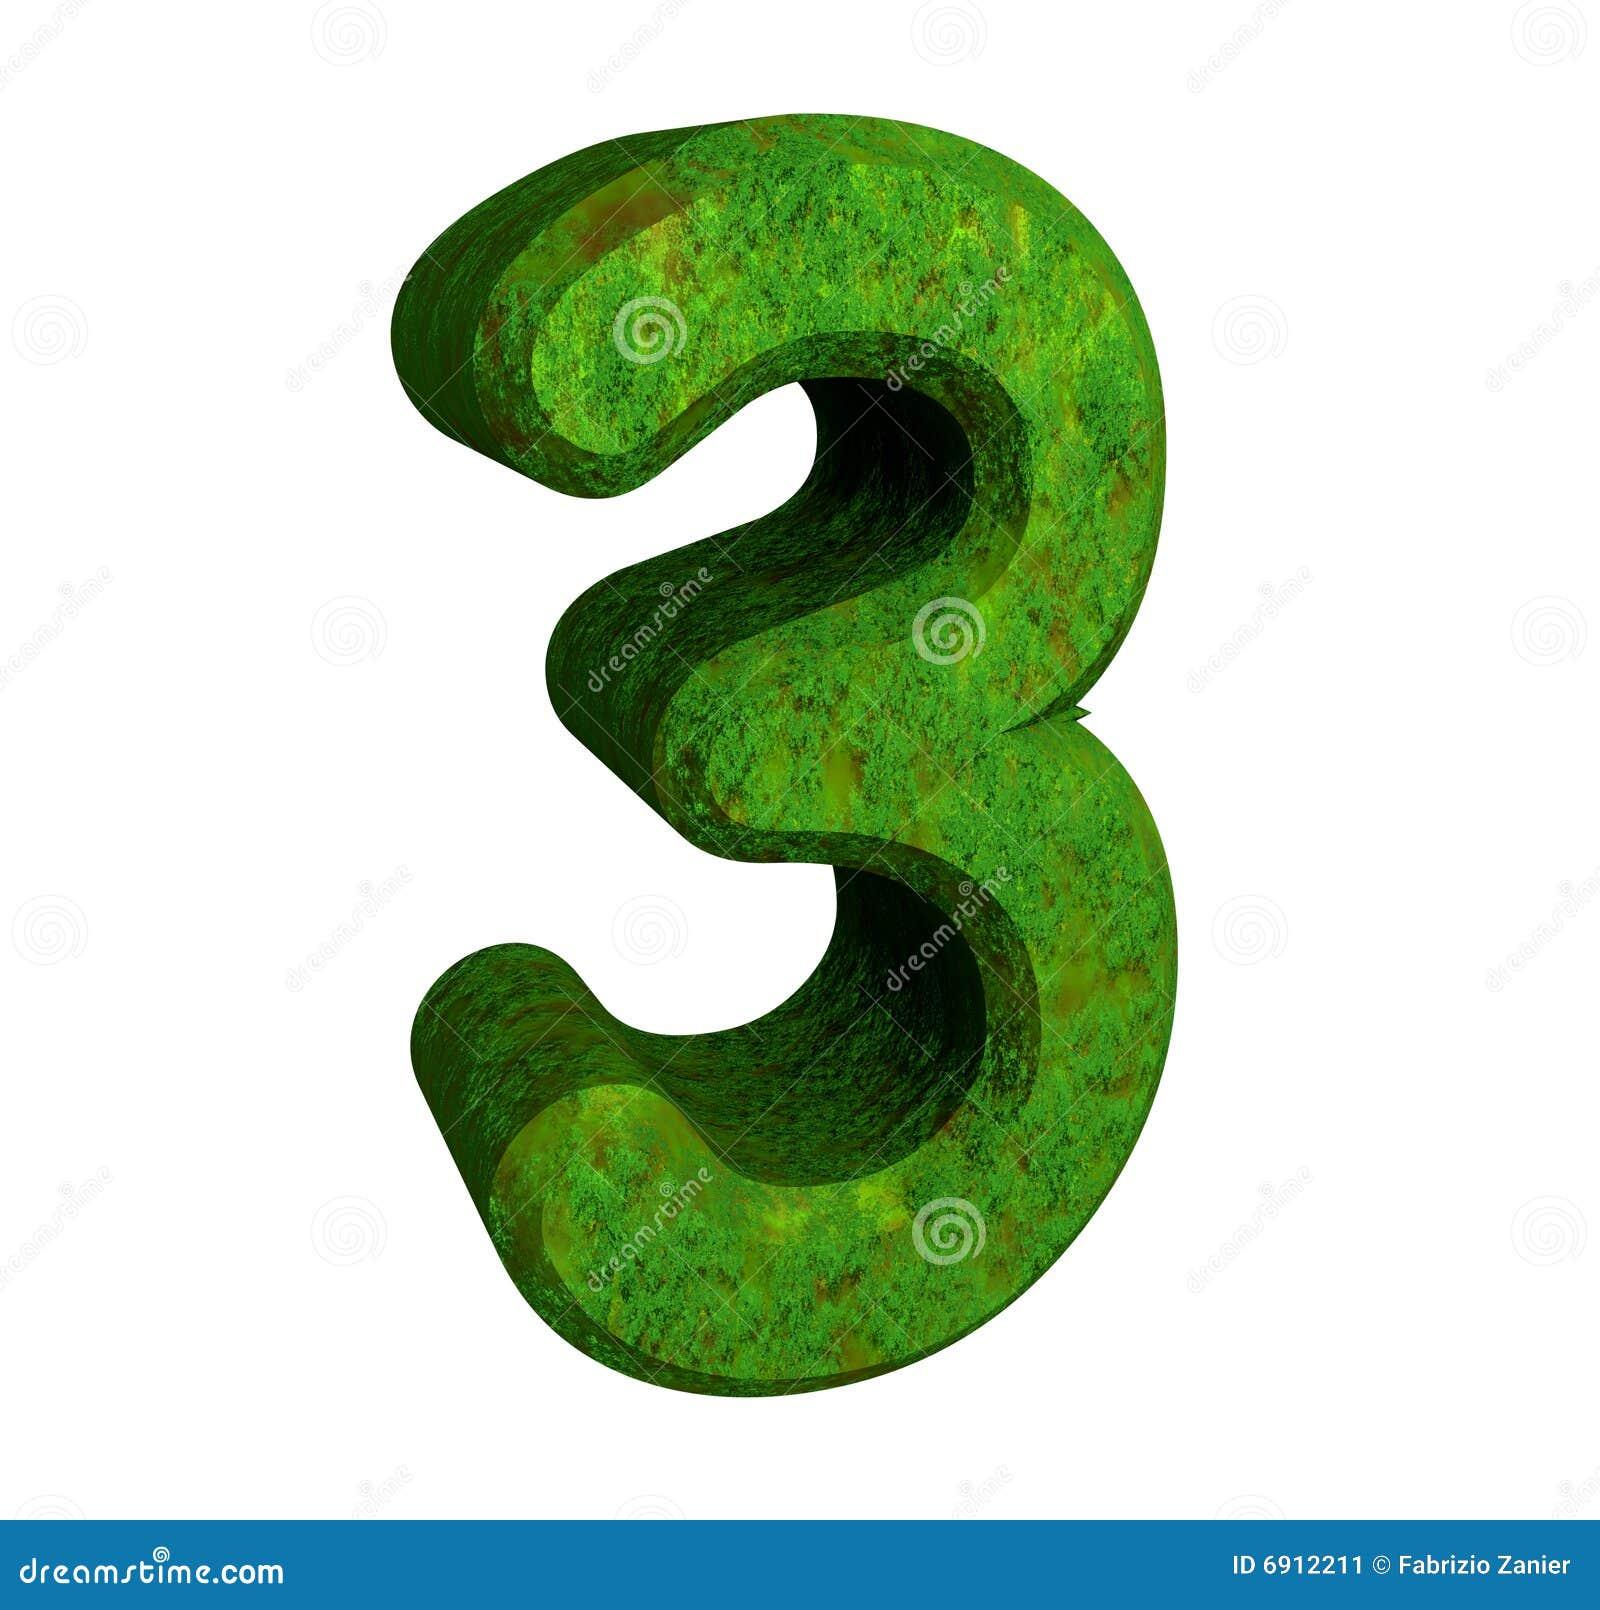 Amount of antioxidants in three green